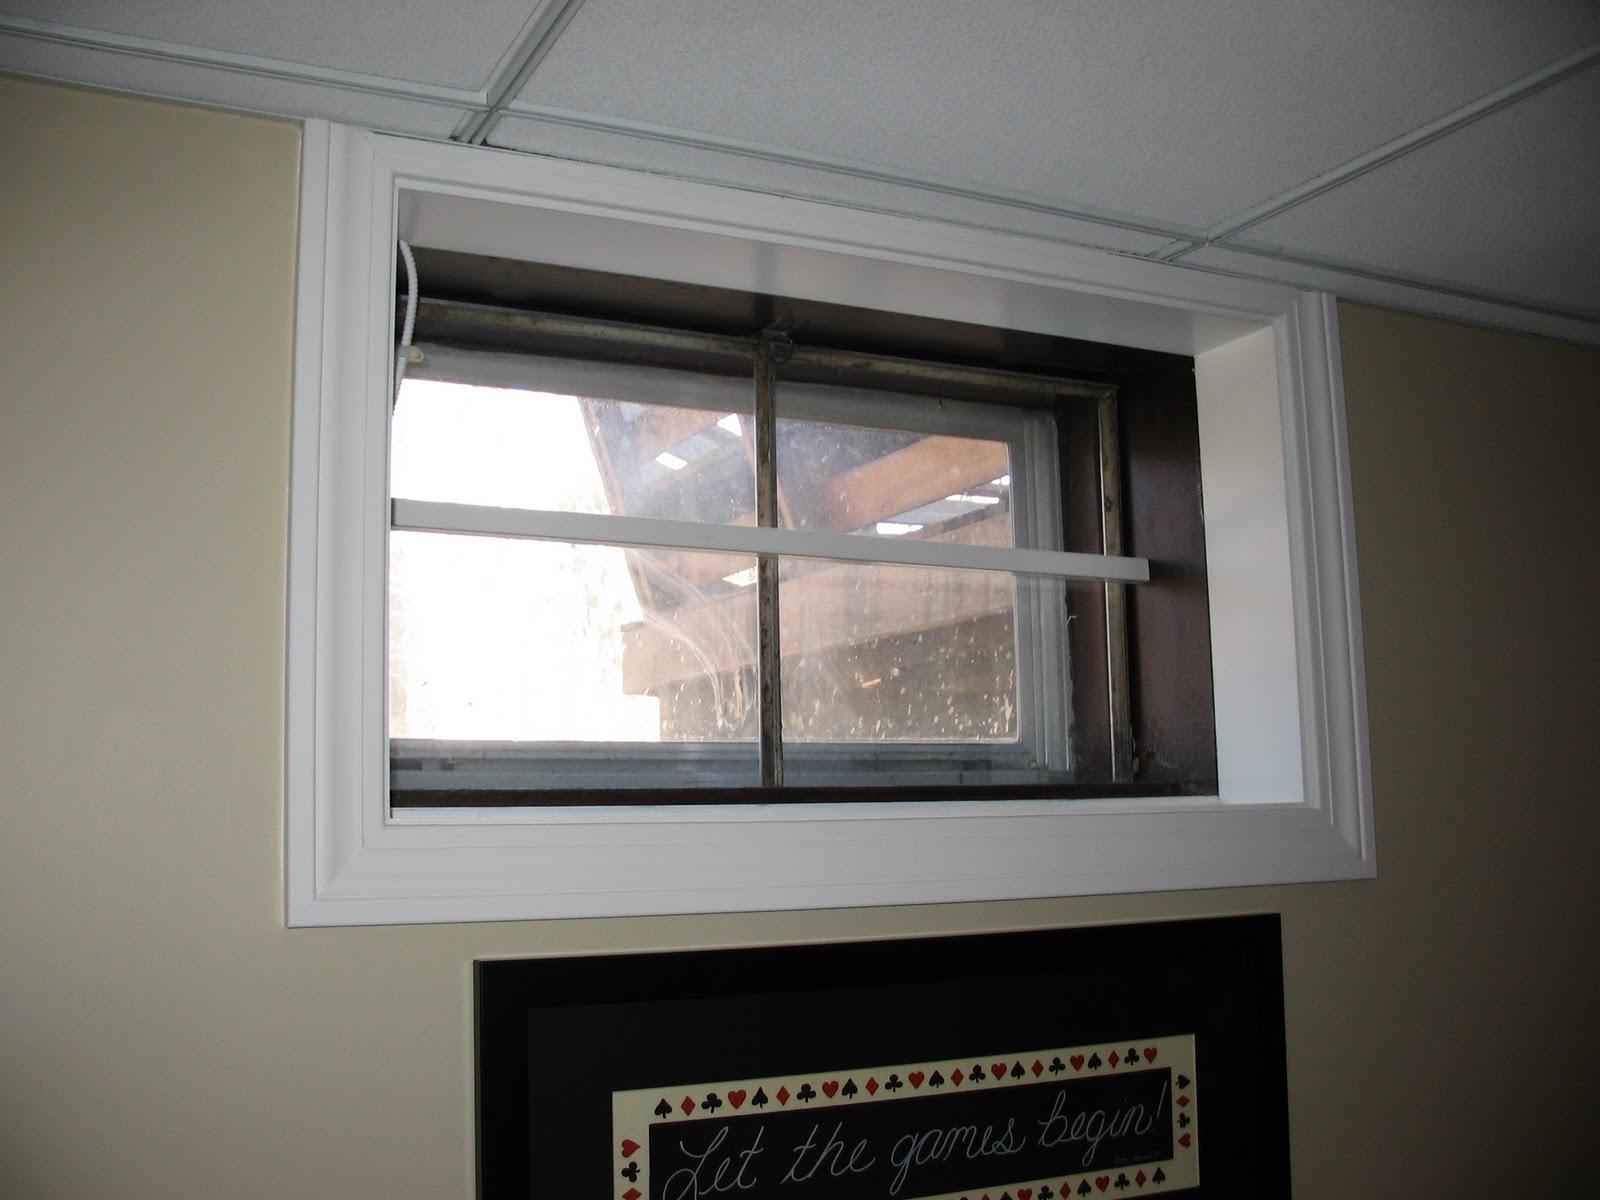 Basement Remodeling Ideas: Basement Window Treatments